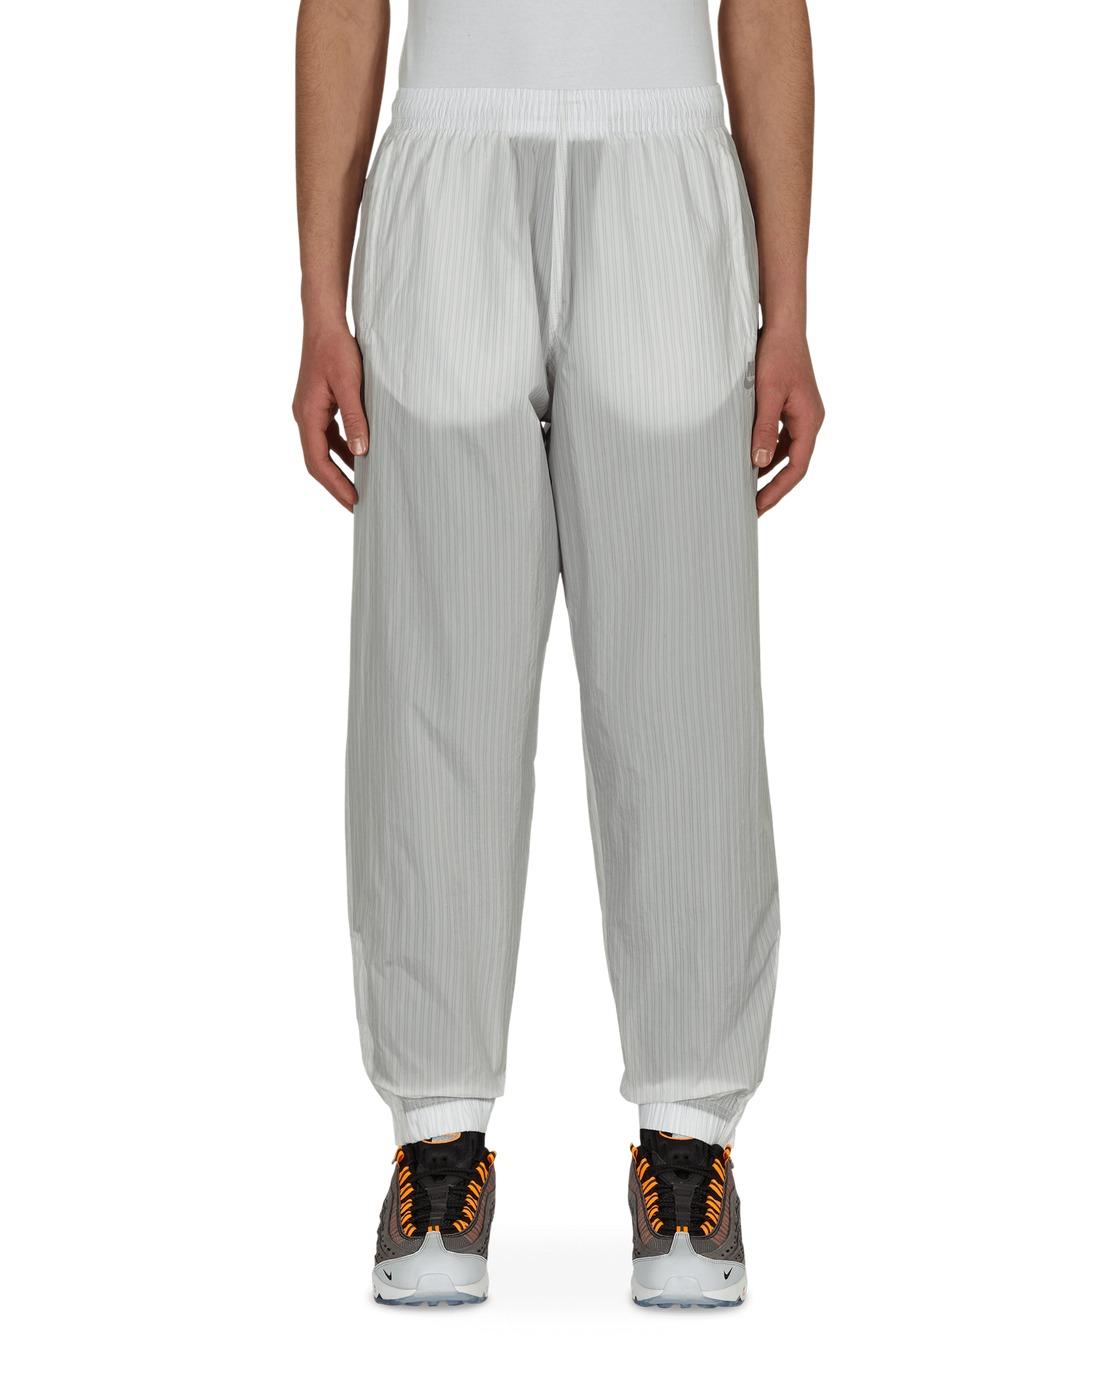 Nike Special Project Kim Jones Track Pants White